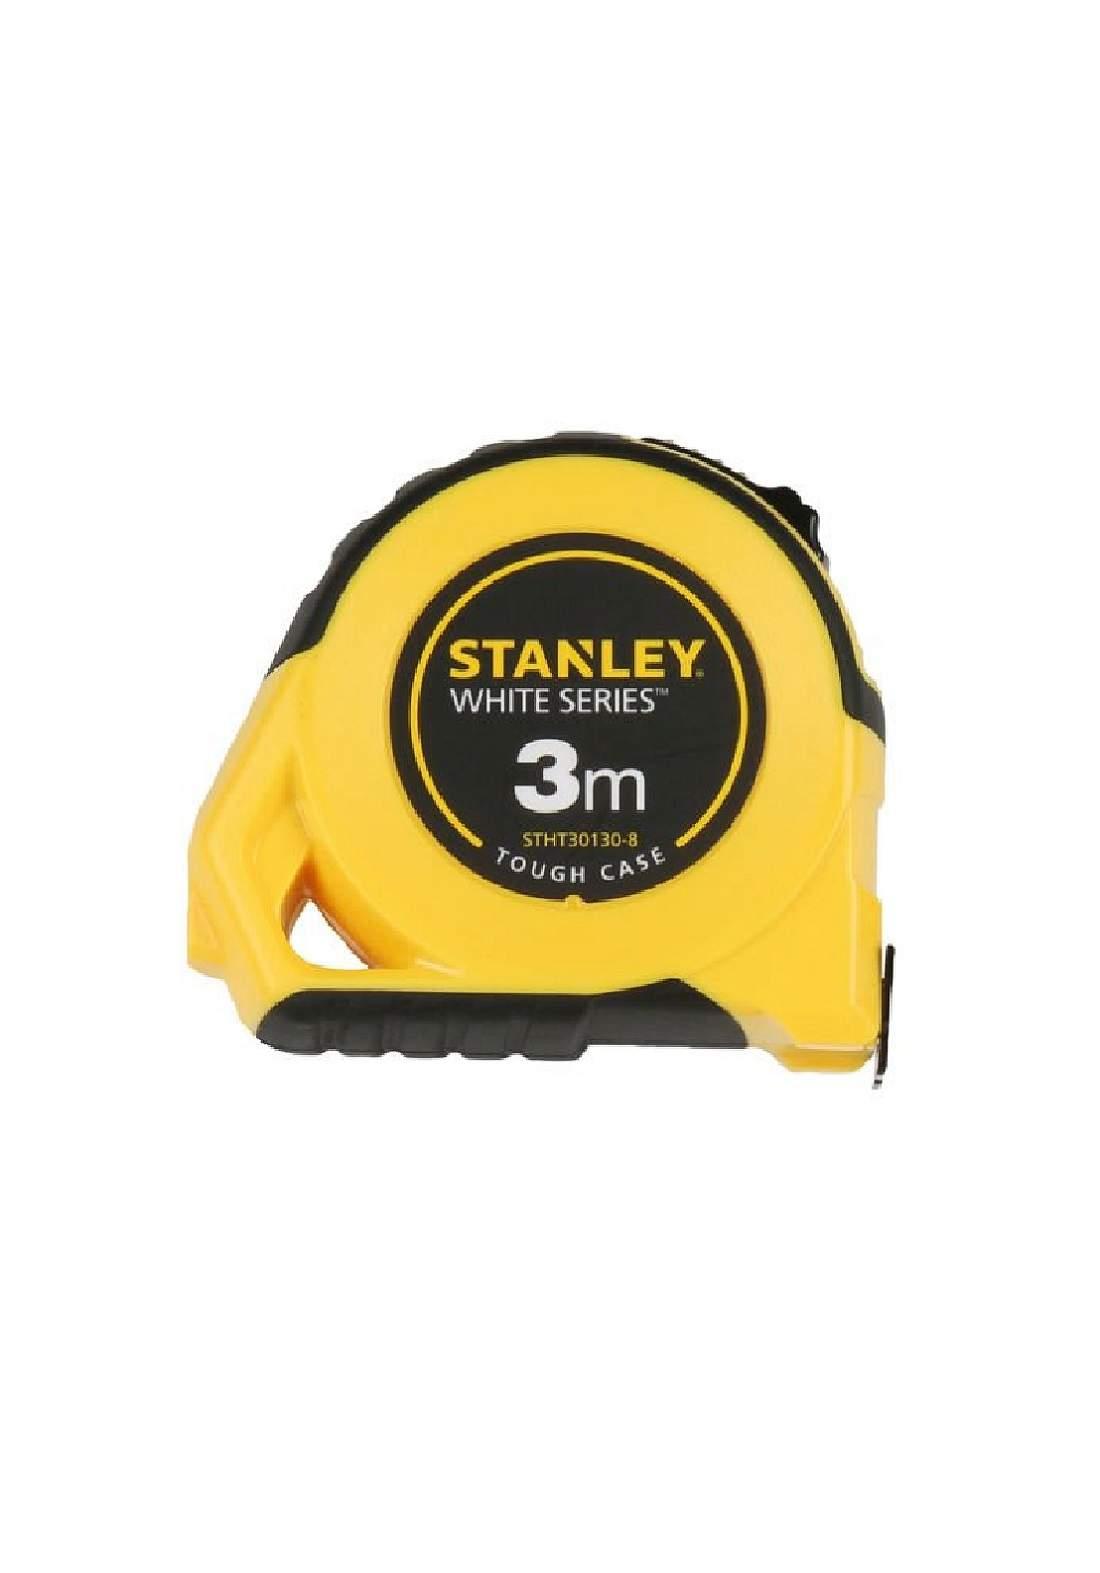 Stanley STHT30278-8  Short Tape Rules 3m x 13mm  فيتة  3 م